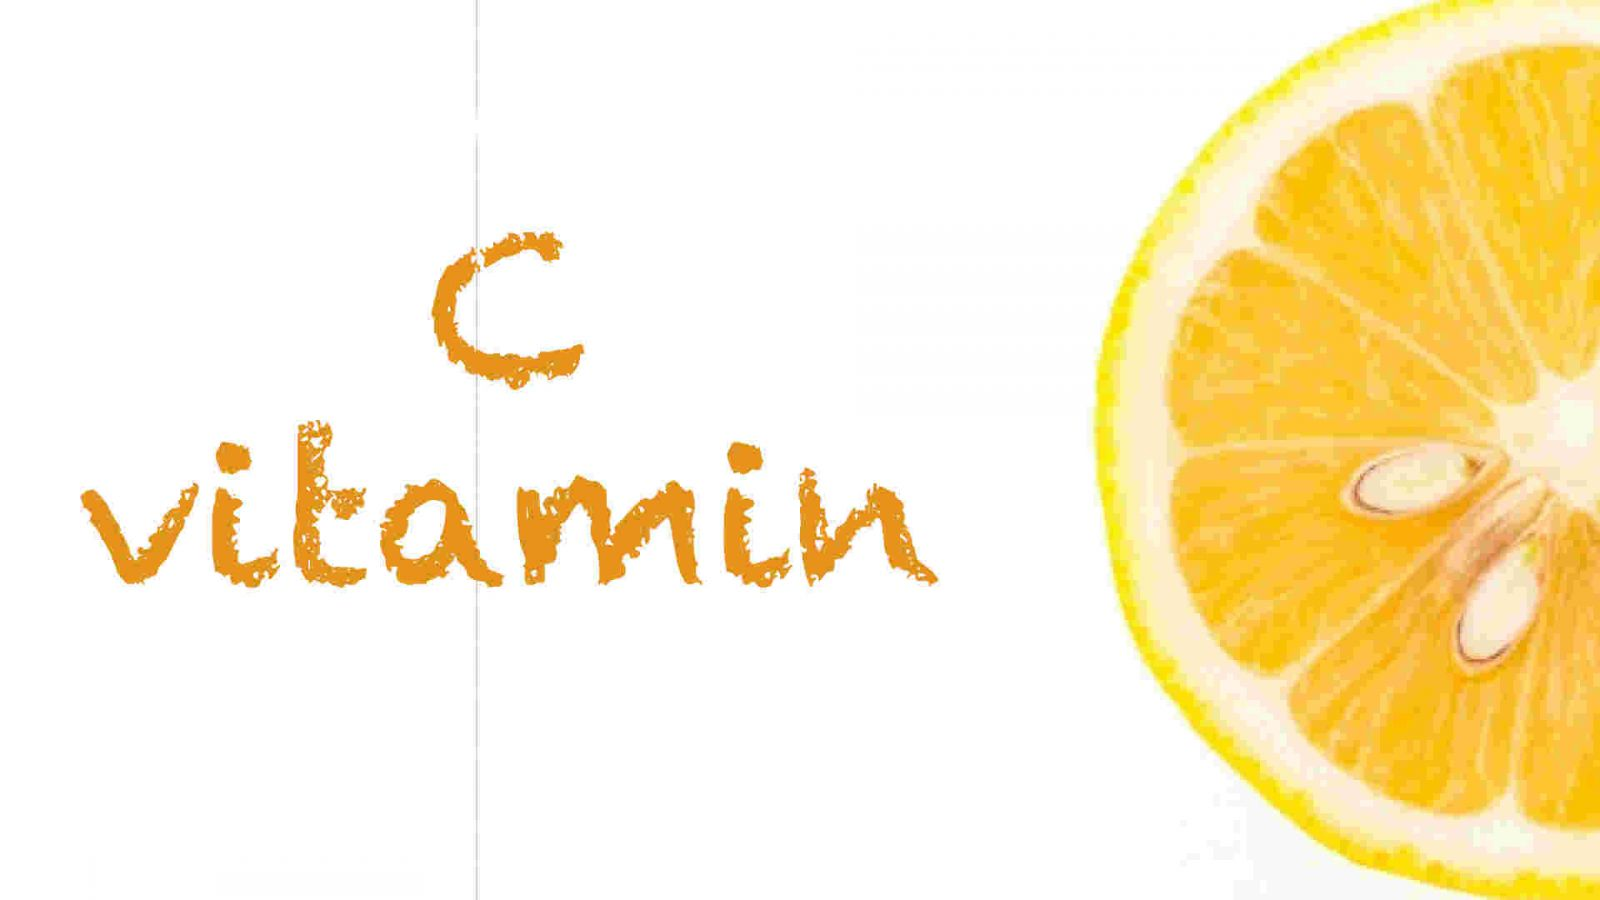 vitaminok a magas vérnyomásért listán